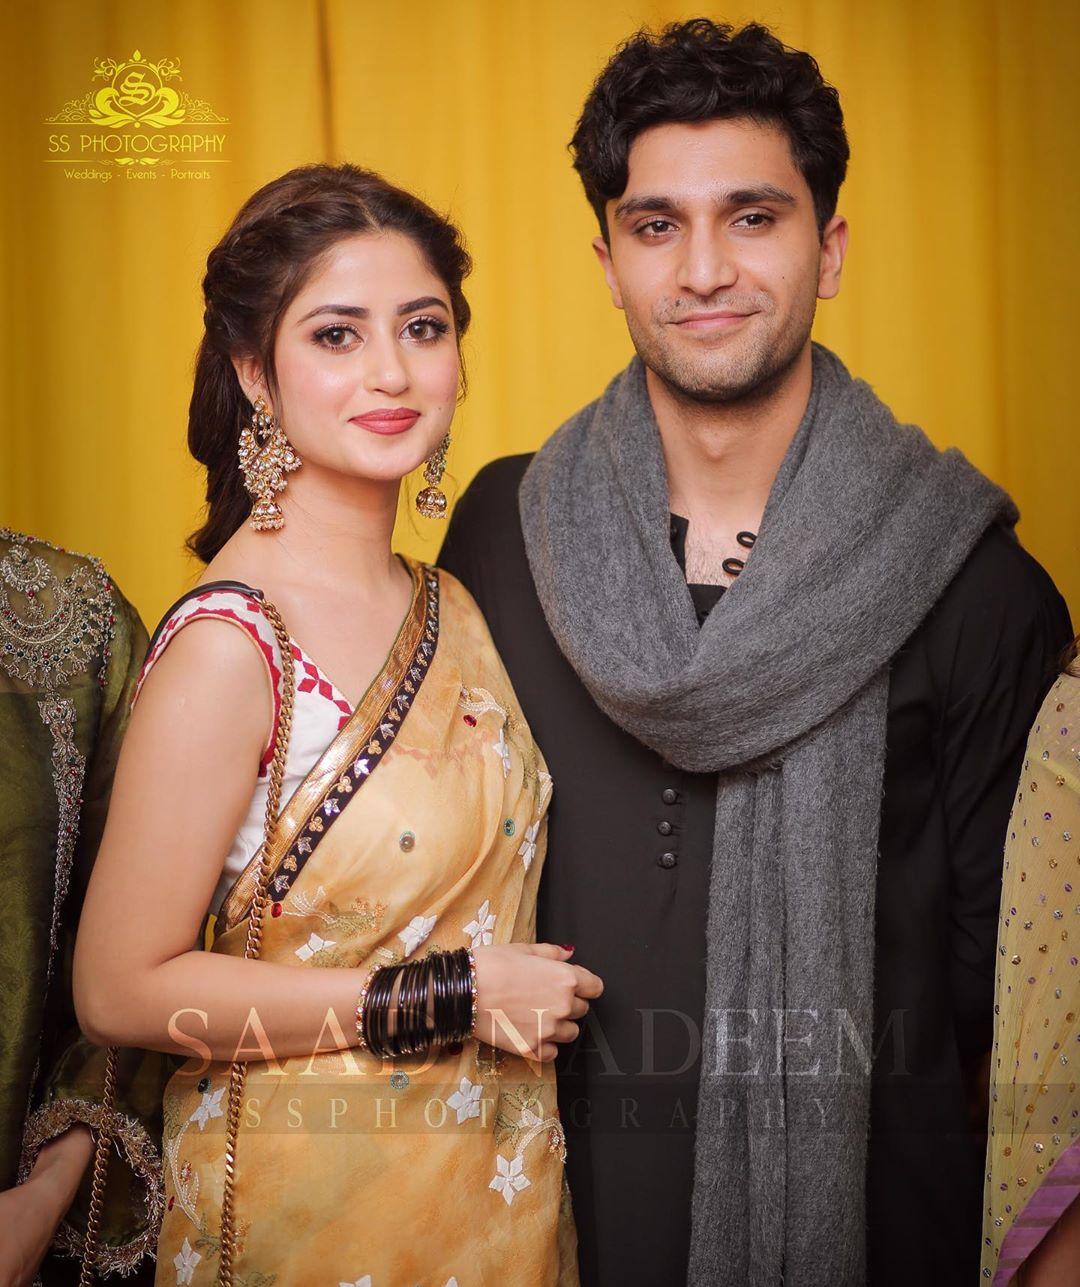 Beautiful HD Pictures of Iqra Aziz and Yasir Hussain Mehndi